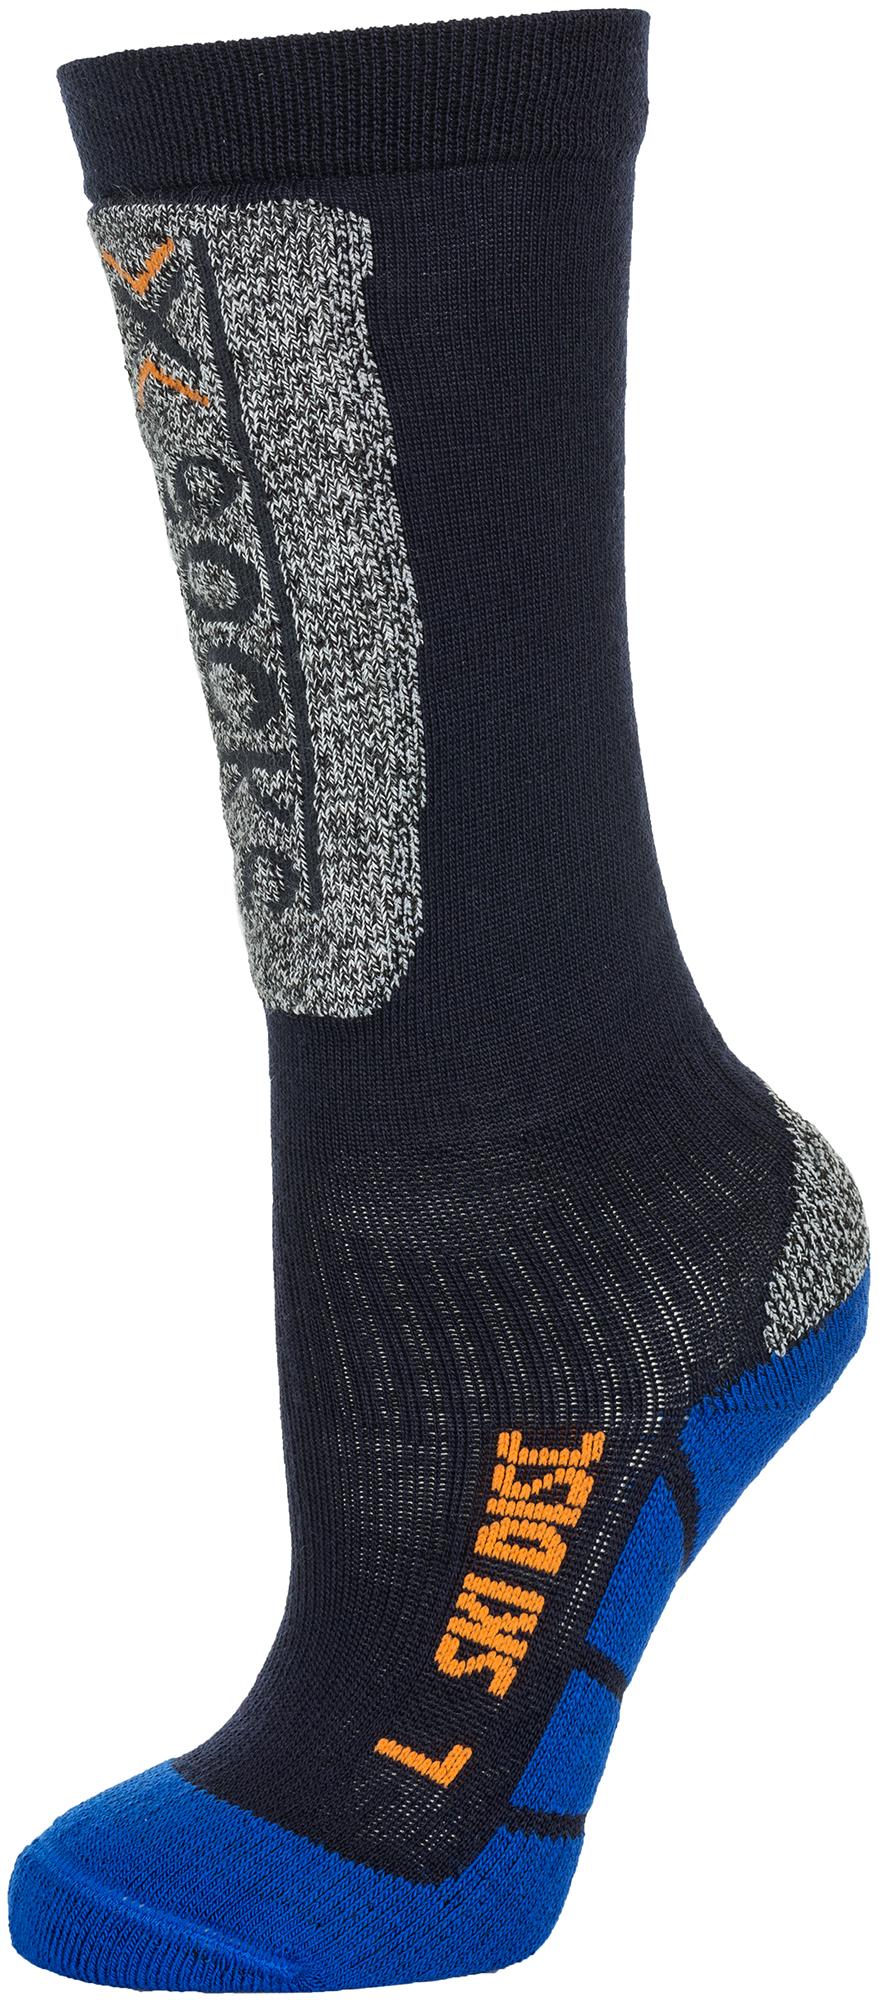 X-Socks Гольфы детские X-Socks, 1 пара